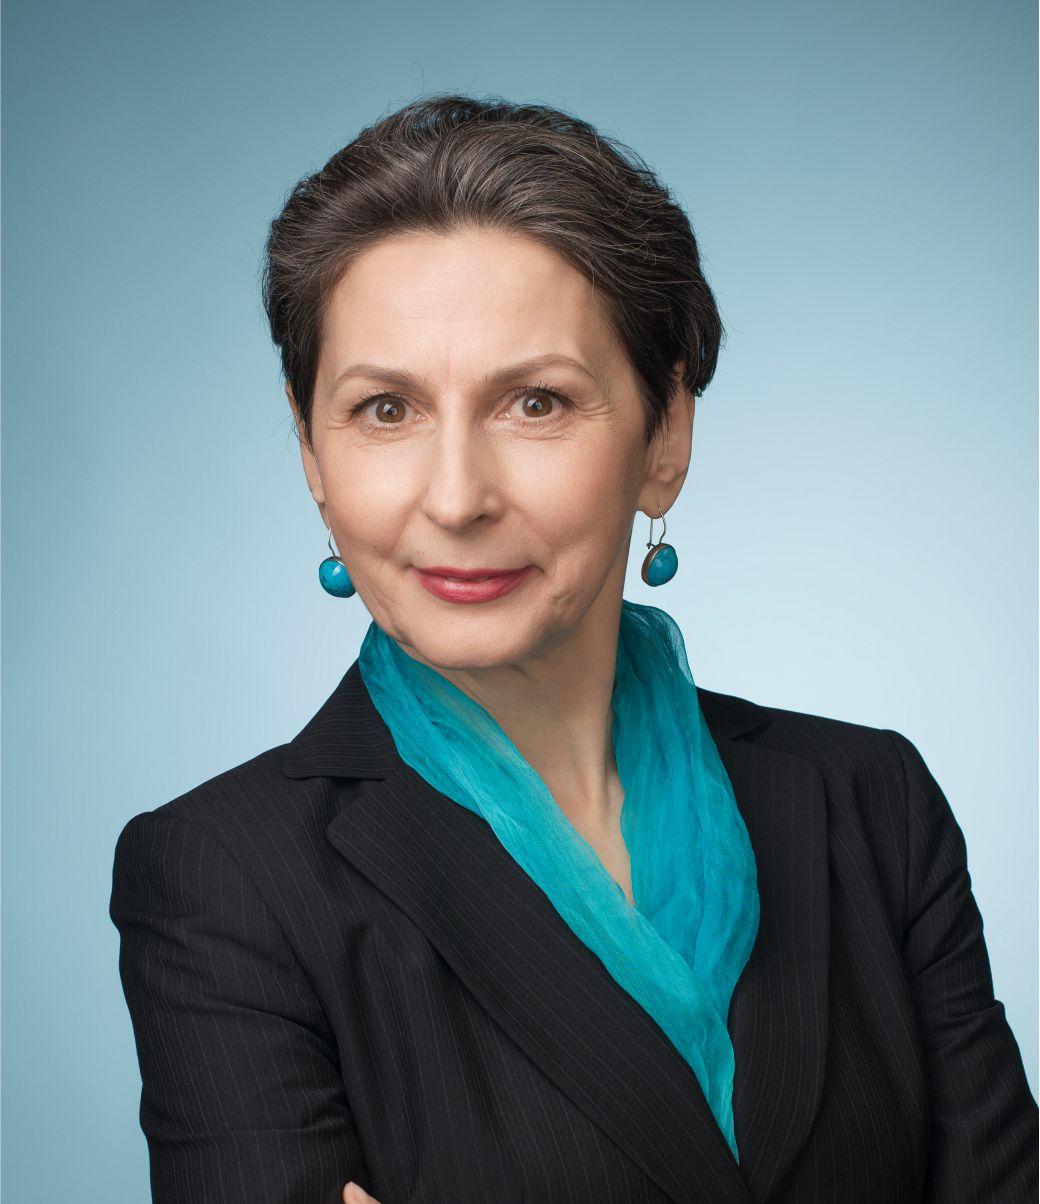 Olga Obsekova